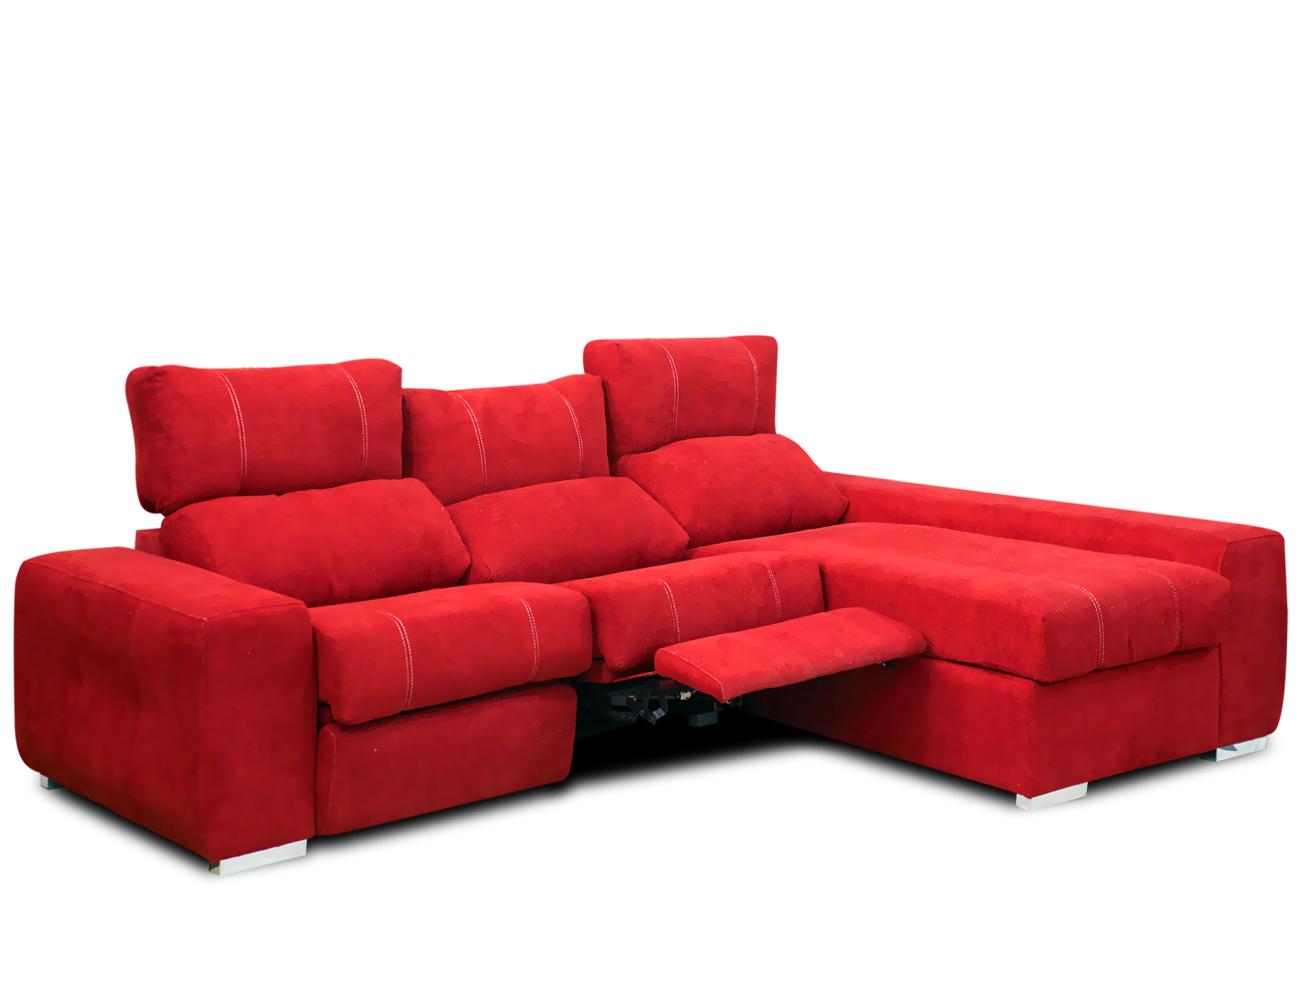 Sofa chaiselongue relax motor electrico 3